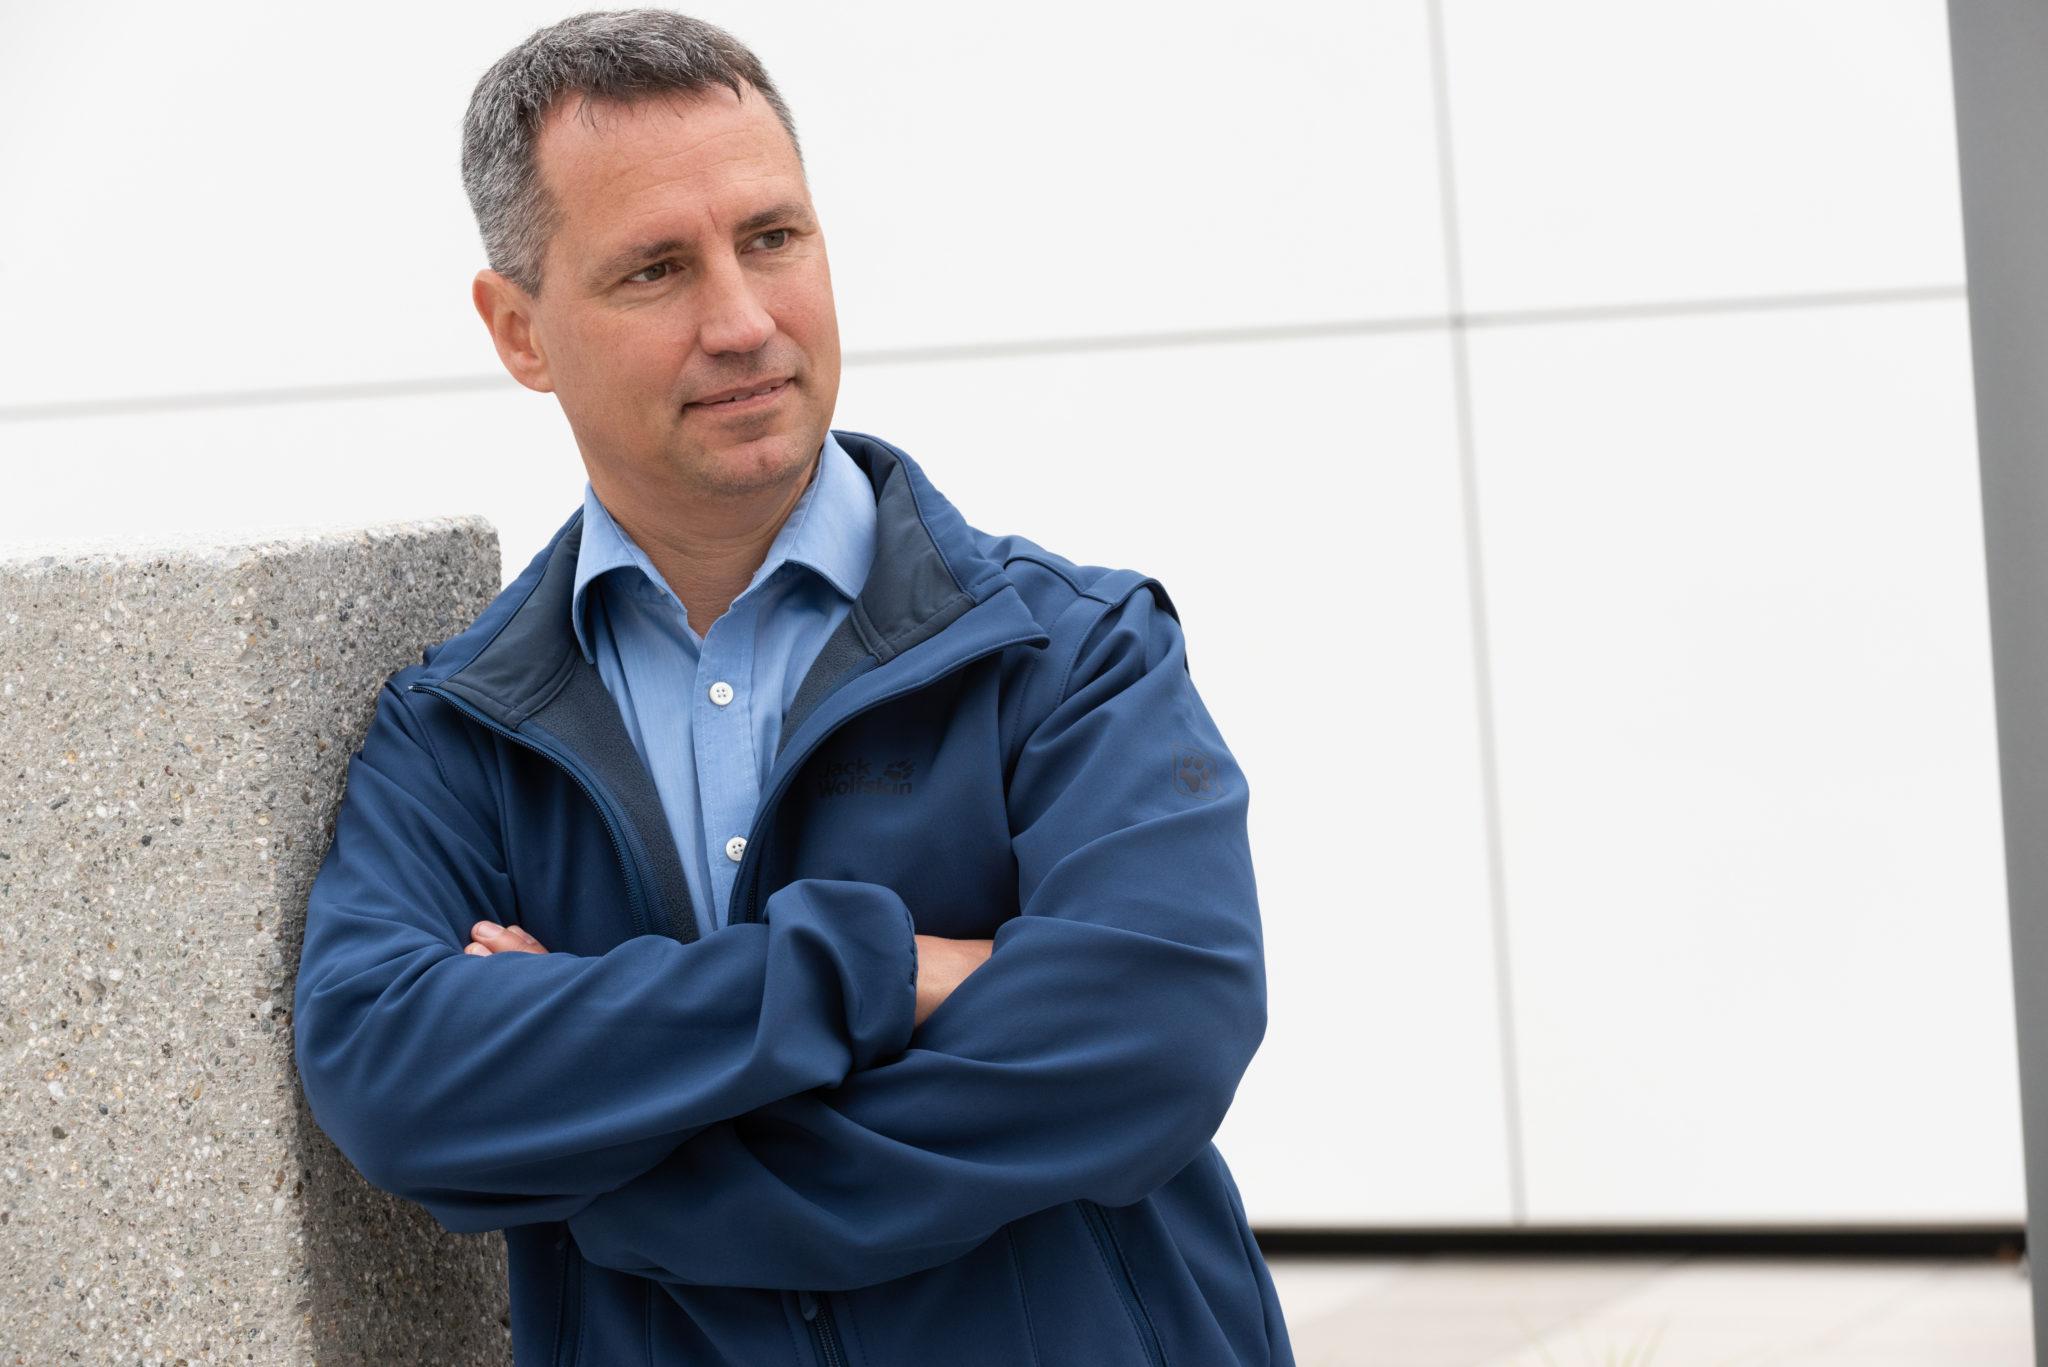 Markus Hiebl | unabhängiger Bürgermeisterkandidat Freilassing